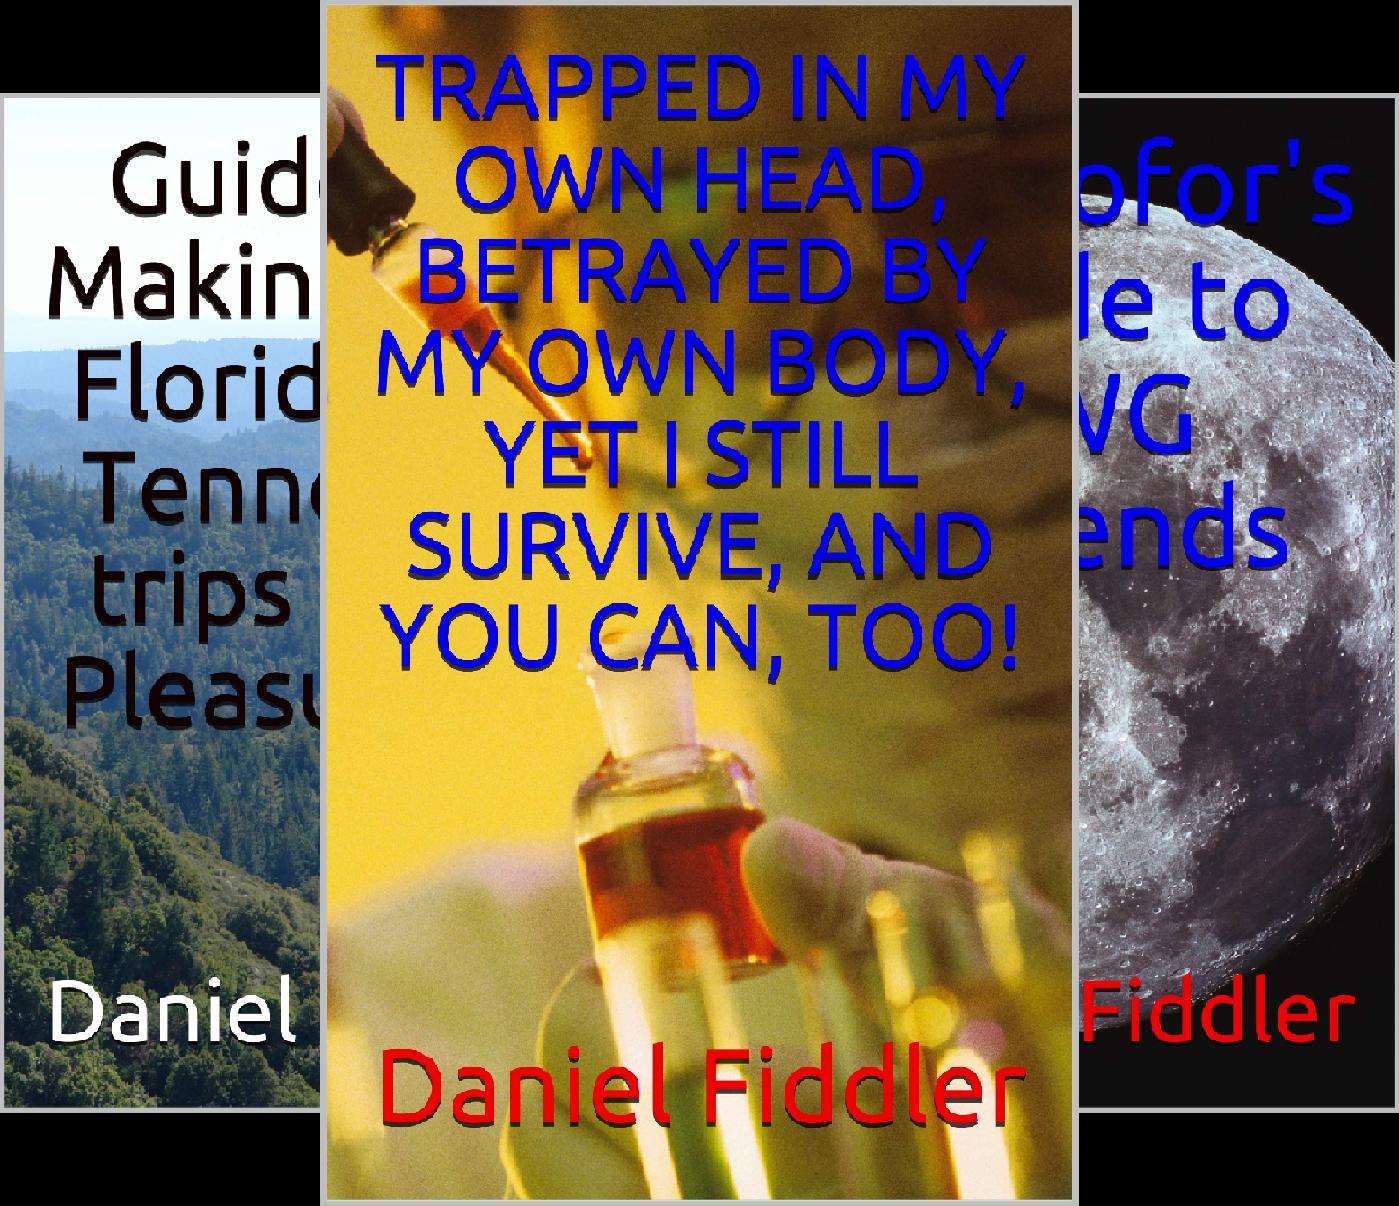 Daniel Fiddler's Books / E-books (6 Book Series)